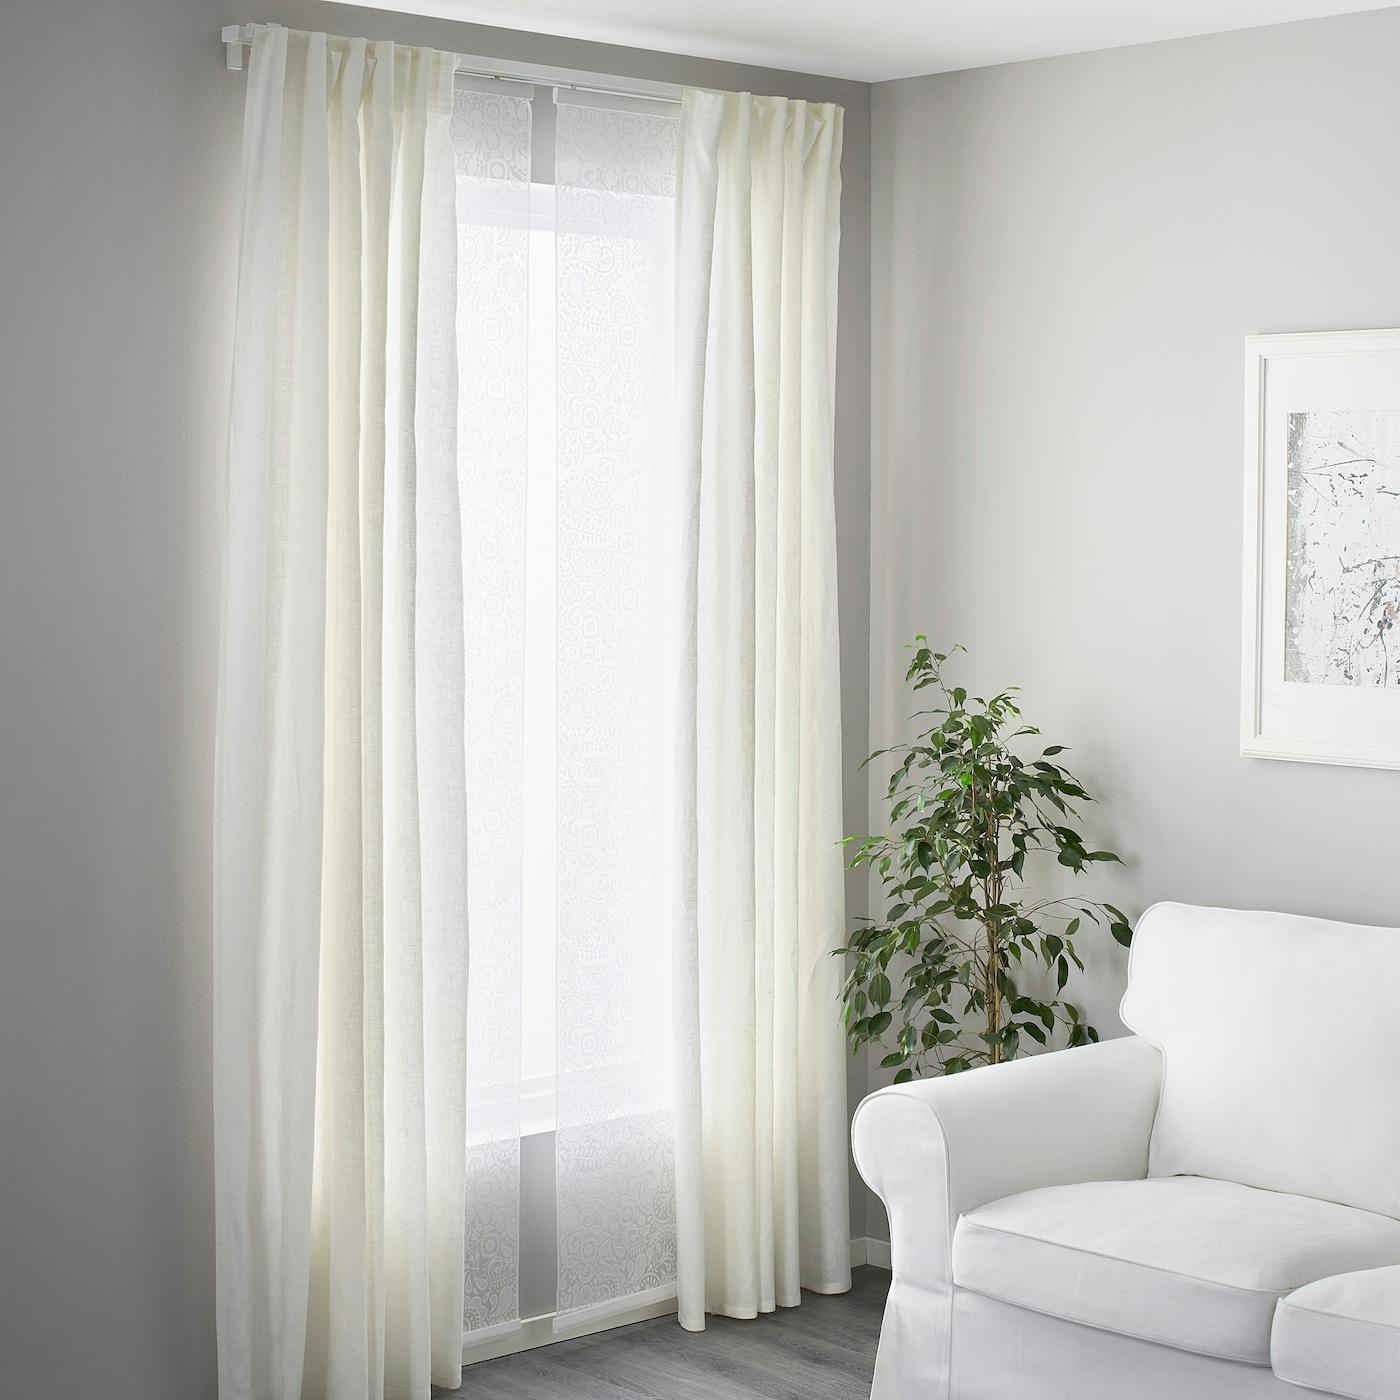 rideau rail Ikea Kvartal rideaux rail aluminium couleurs; 1-chaleur; 140cm